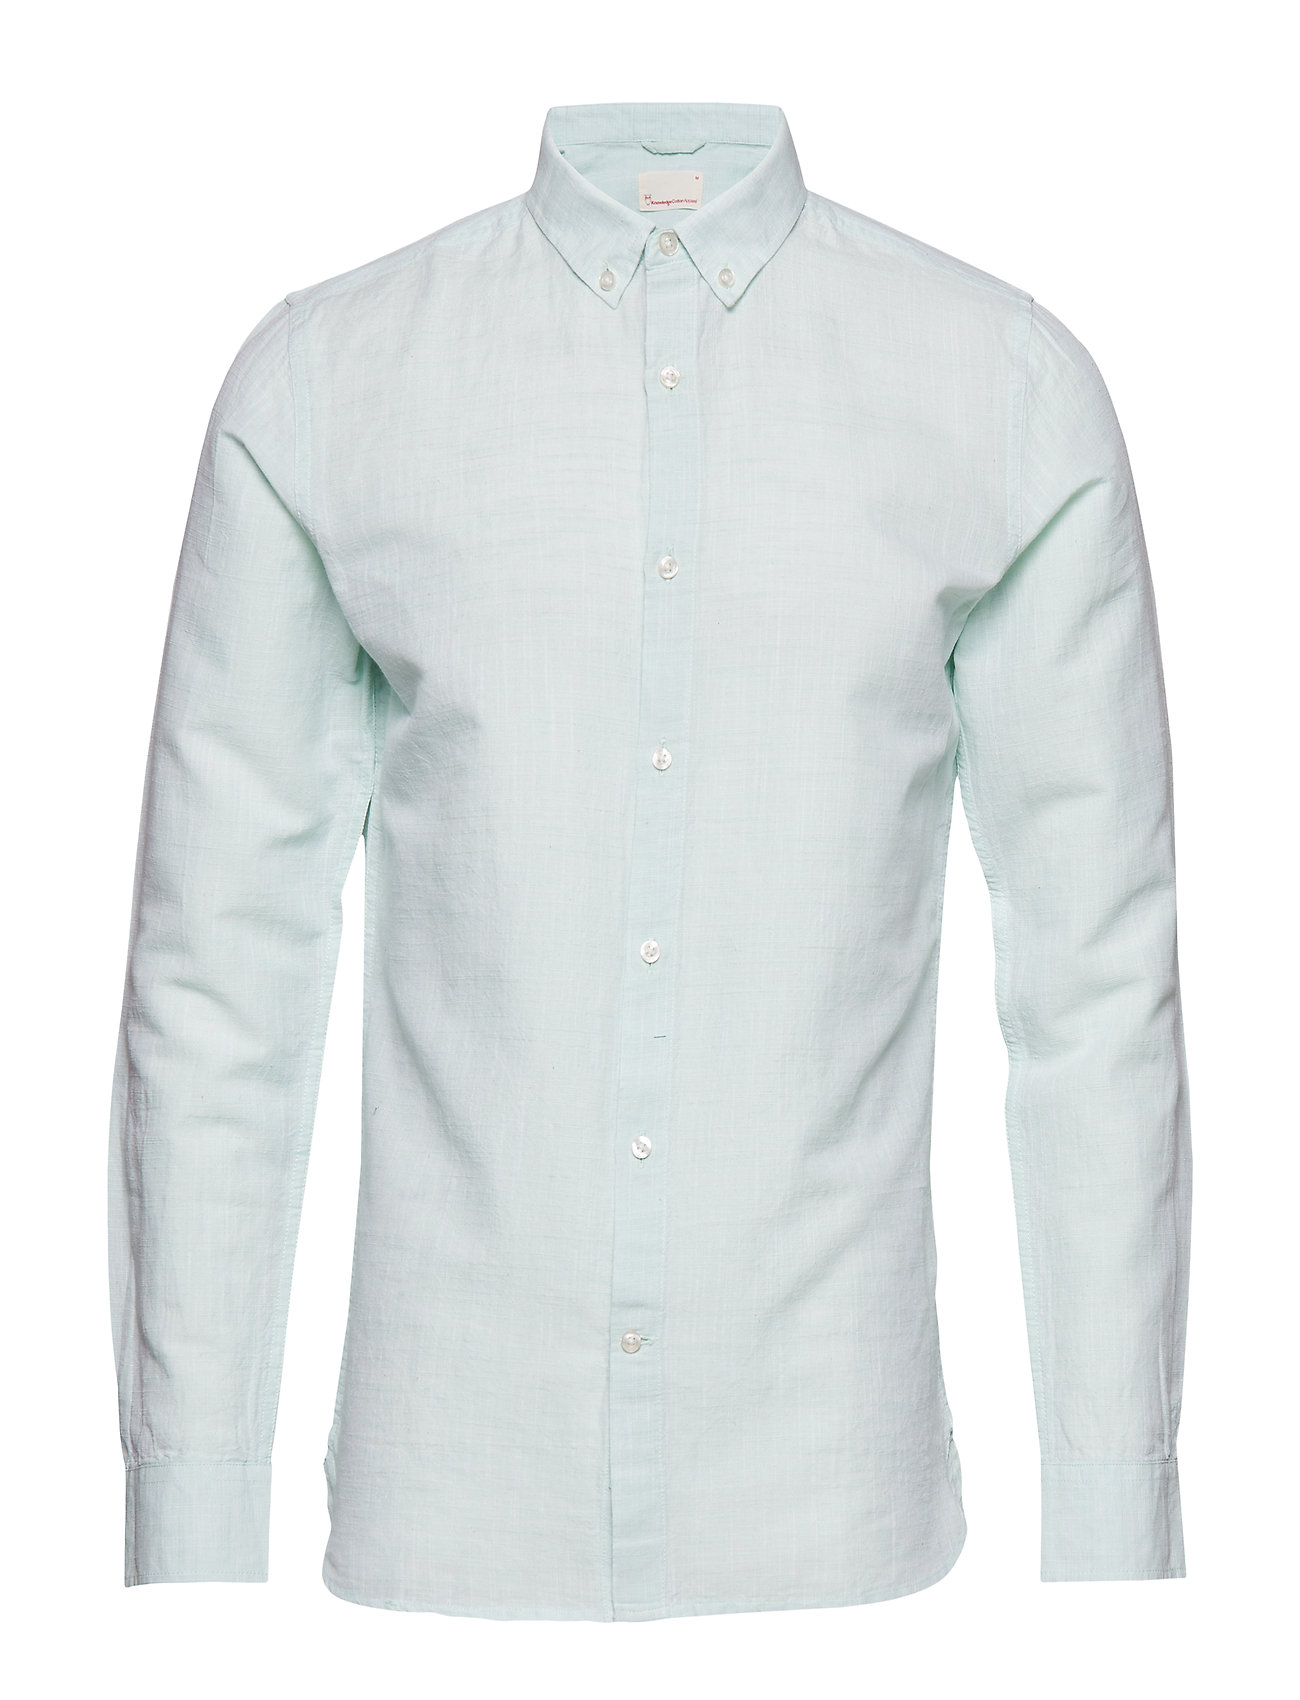 Knowledge Cotton Apparel Cotton linen long sleeved shirt - G - DUSTY JADE GREEN